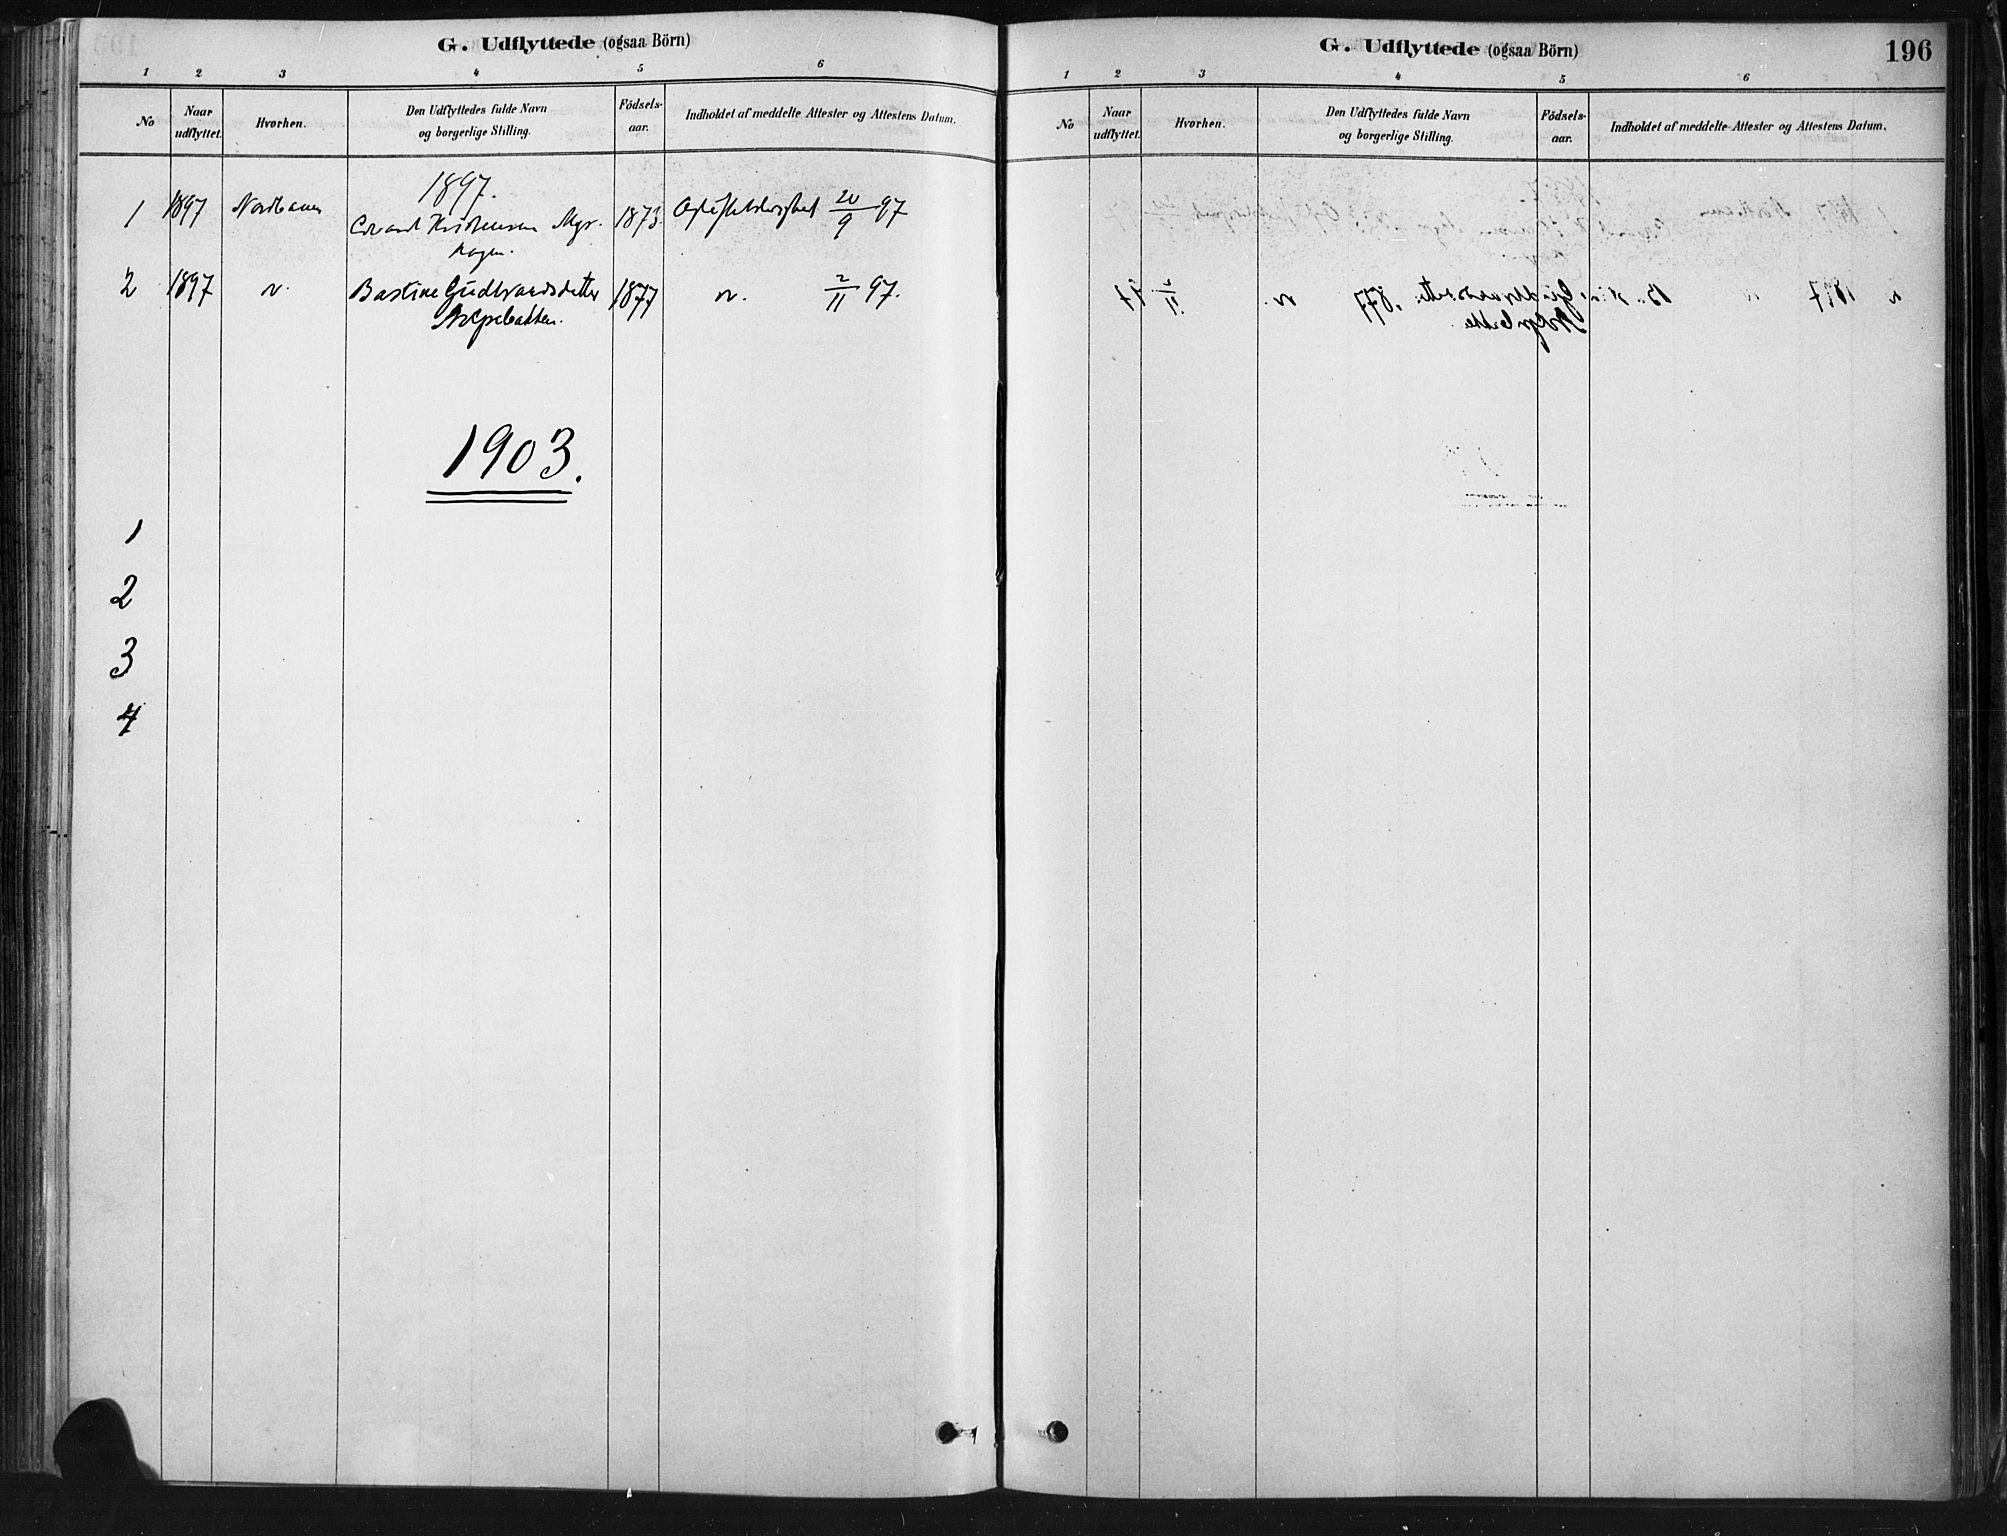 SAH, Ringebu prestekontor, Ministerialbok nr. 9, 1878-1898, s. 196